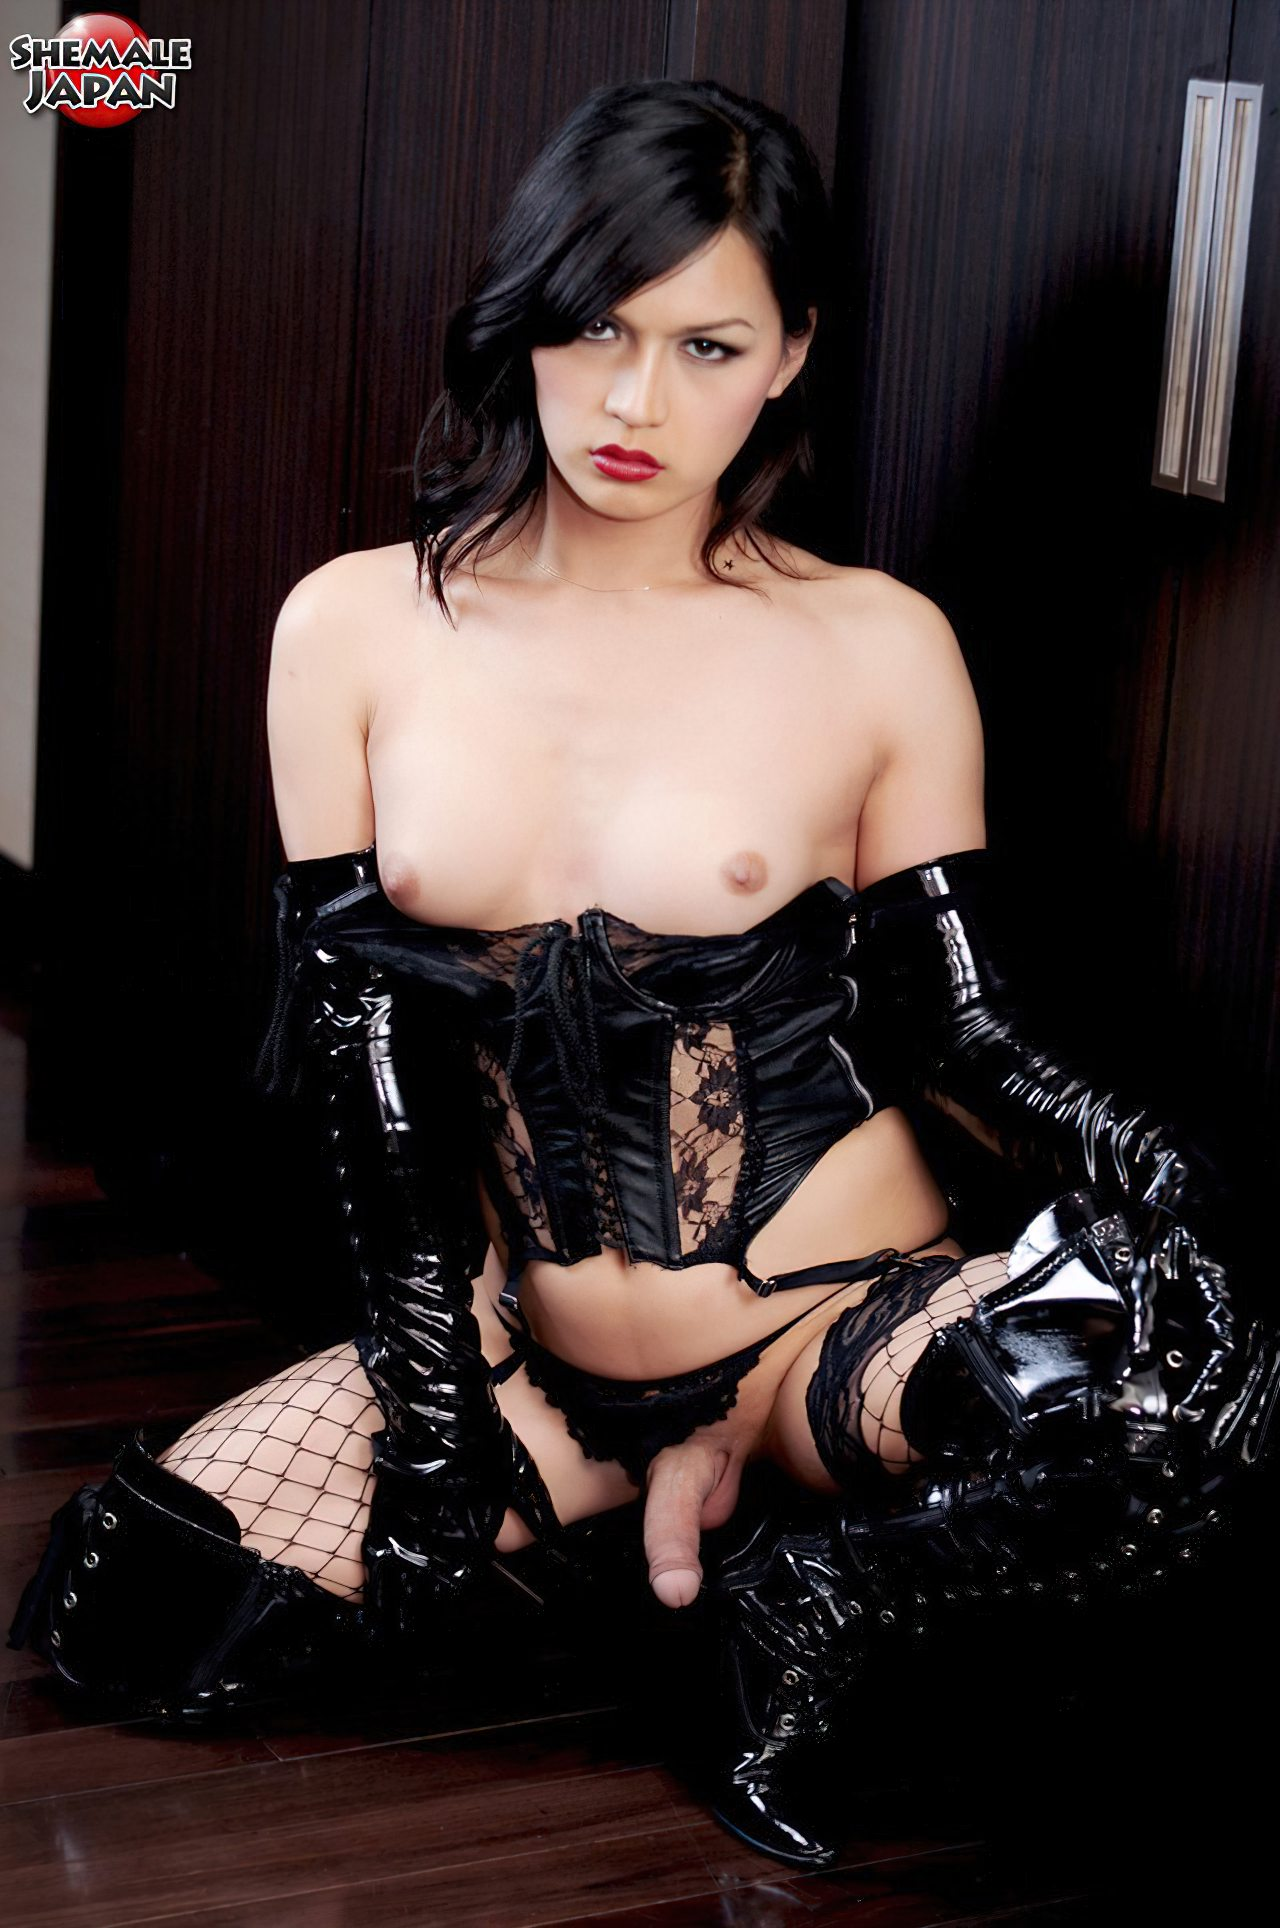 Travesti Japonesa Elegante (4)